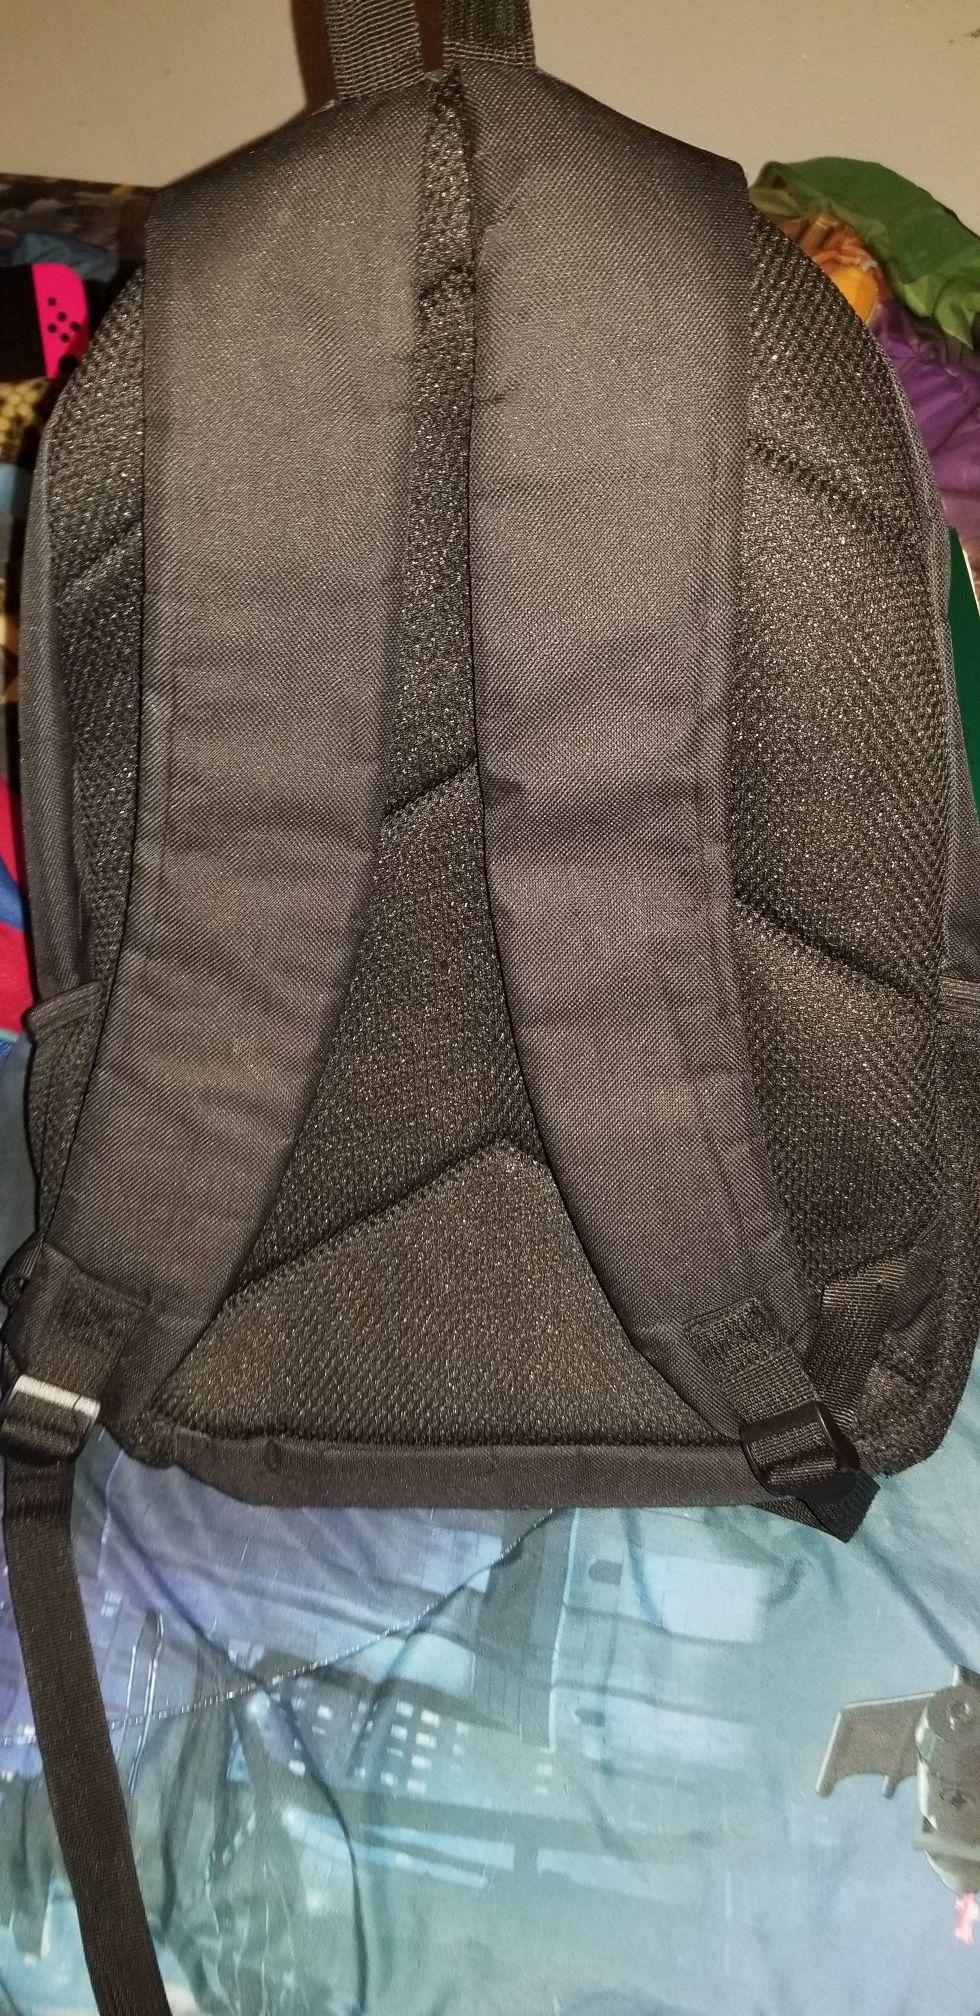 Brand new! DJ marshmallow backpack